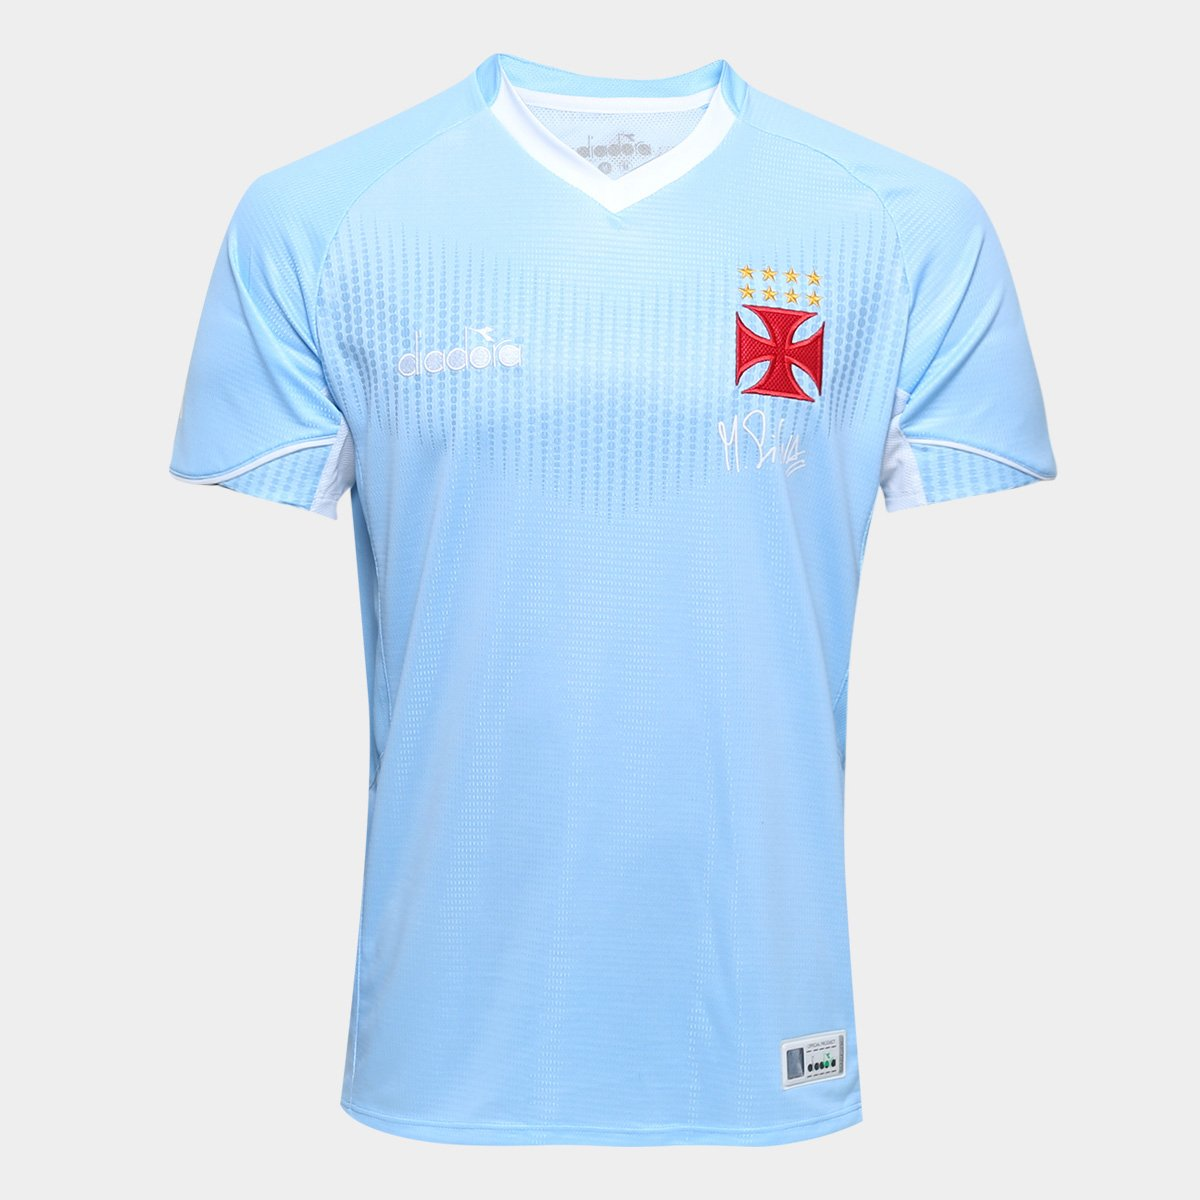 b5e8c81d9d Camisa de Goleiro Vasco I 2018 s n° Torcedor Diadora Masculina ...